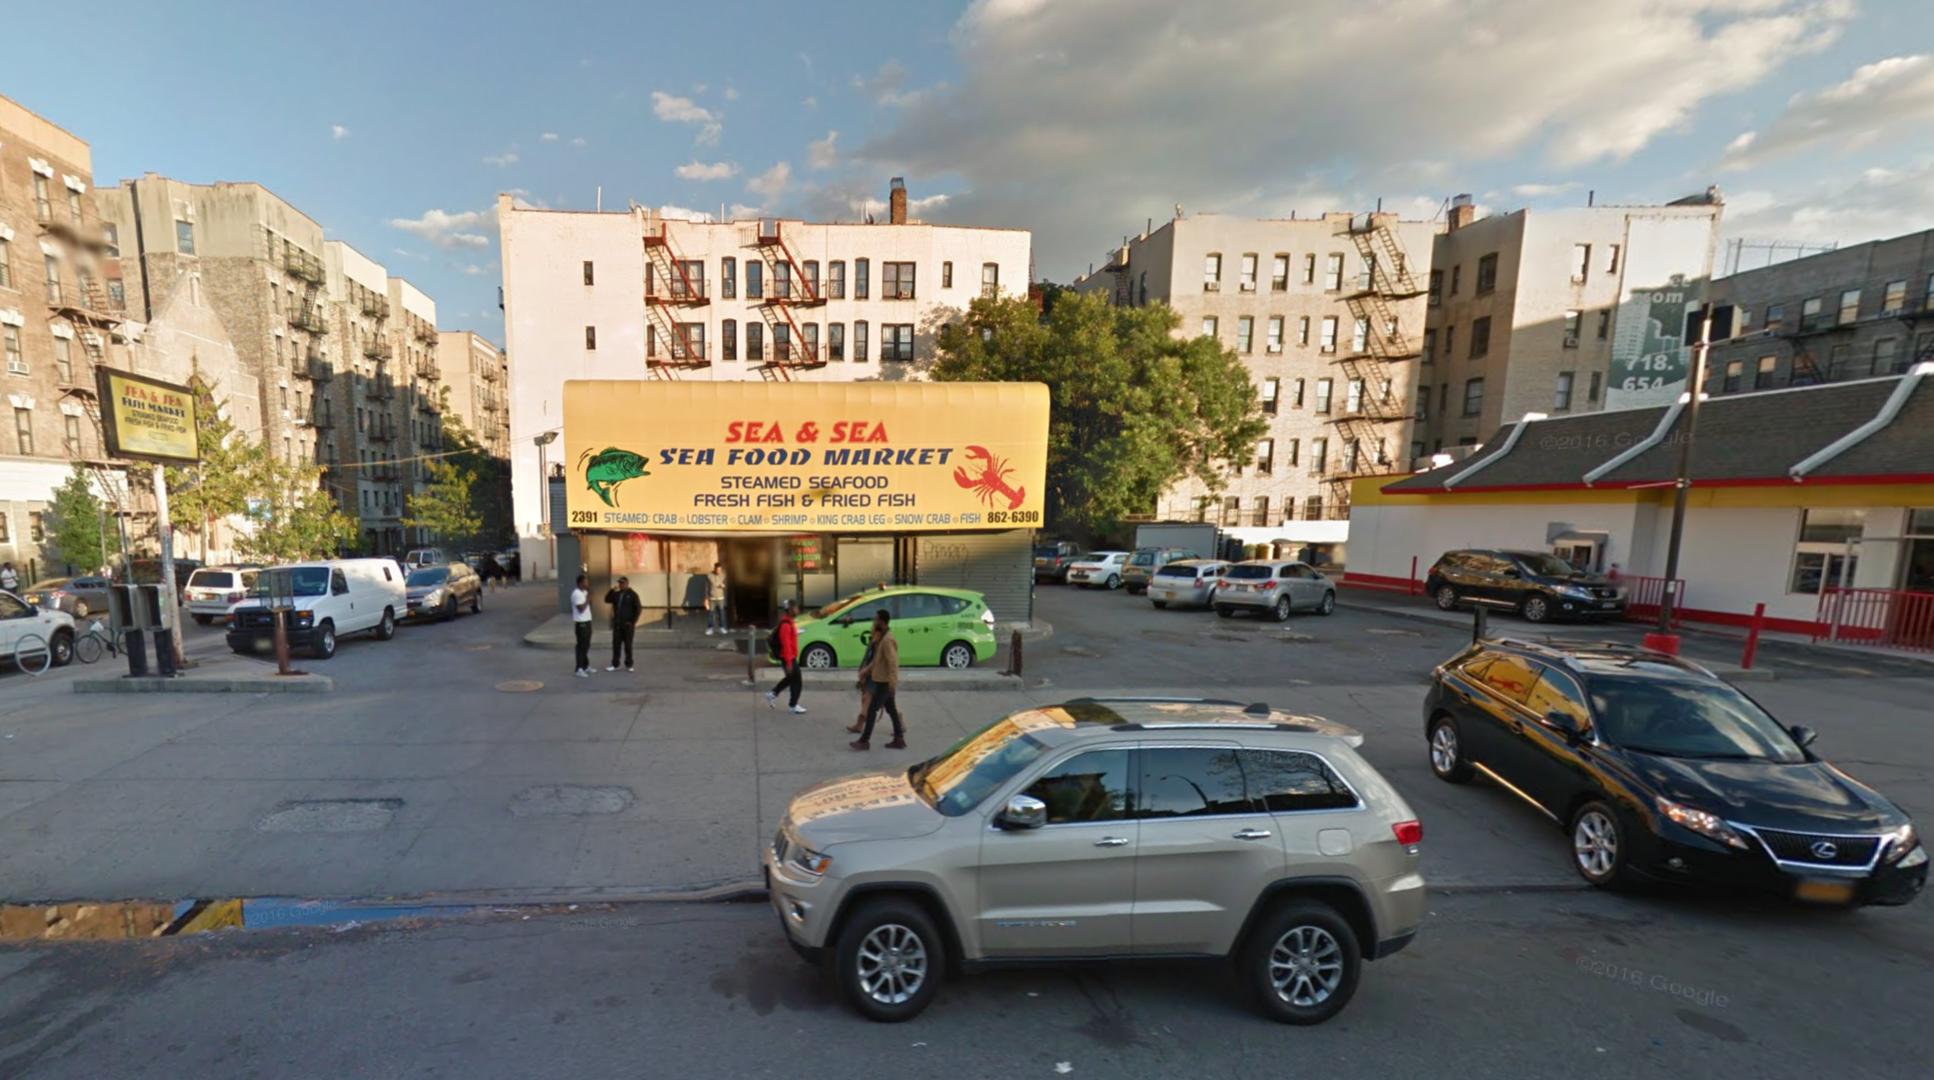 152 West 140th Street, image via Google Maps